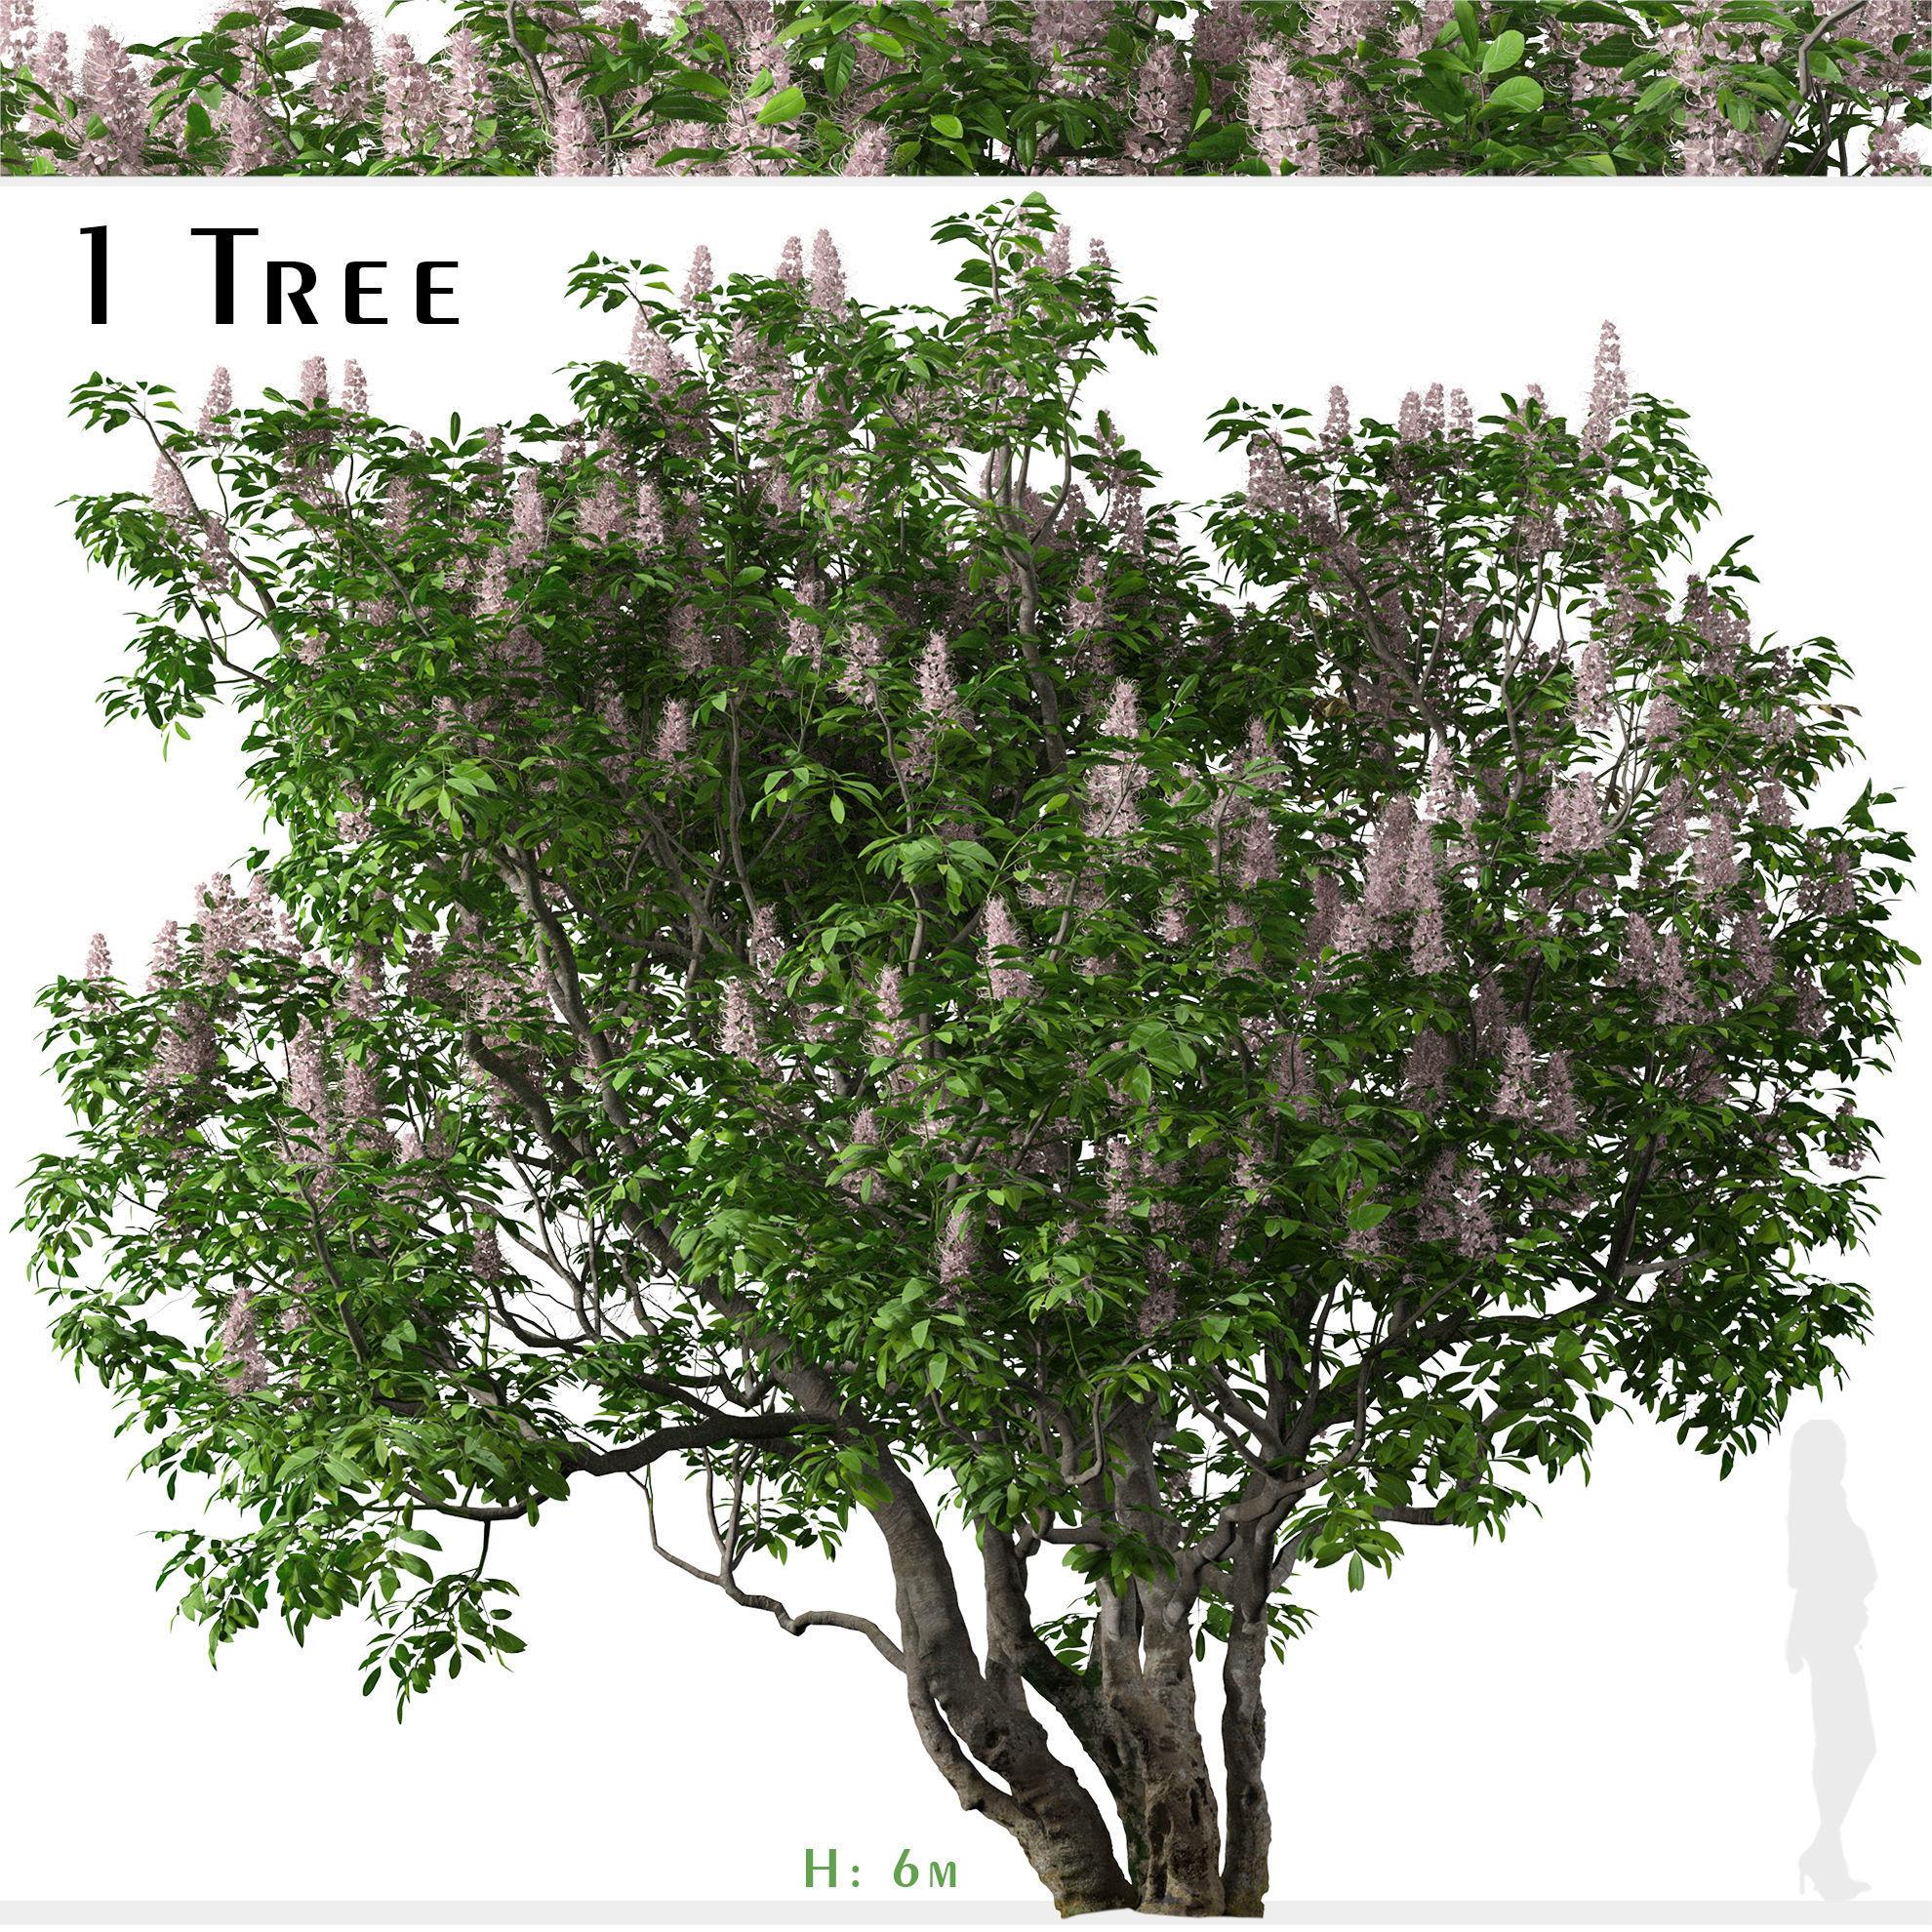 California buckeye or Aesculus californica Tree